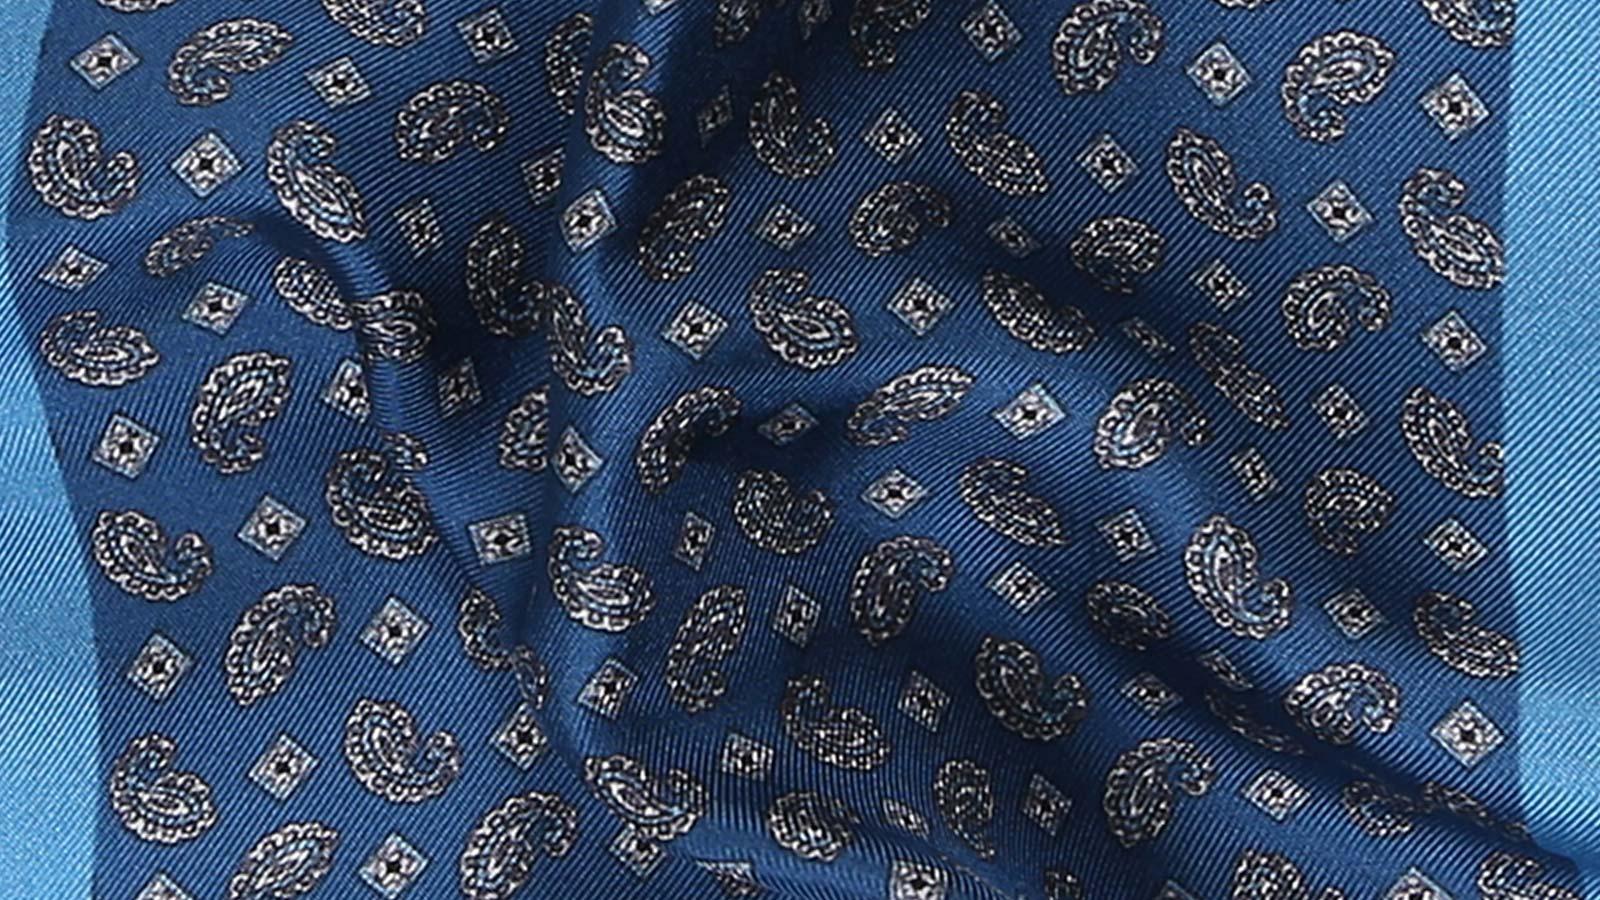 Steel Blue & Silver Italian 100% Silk Pocket Square - slider image 1